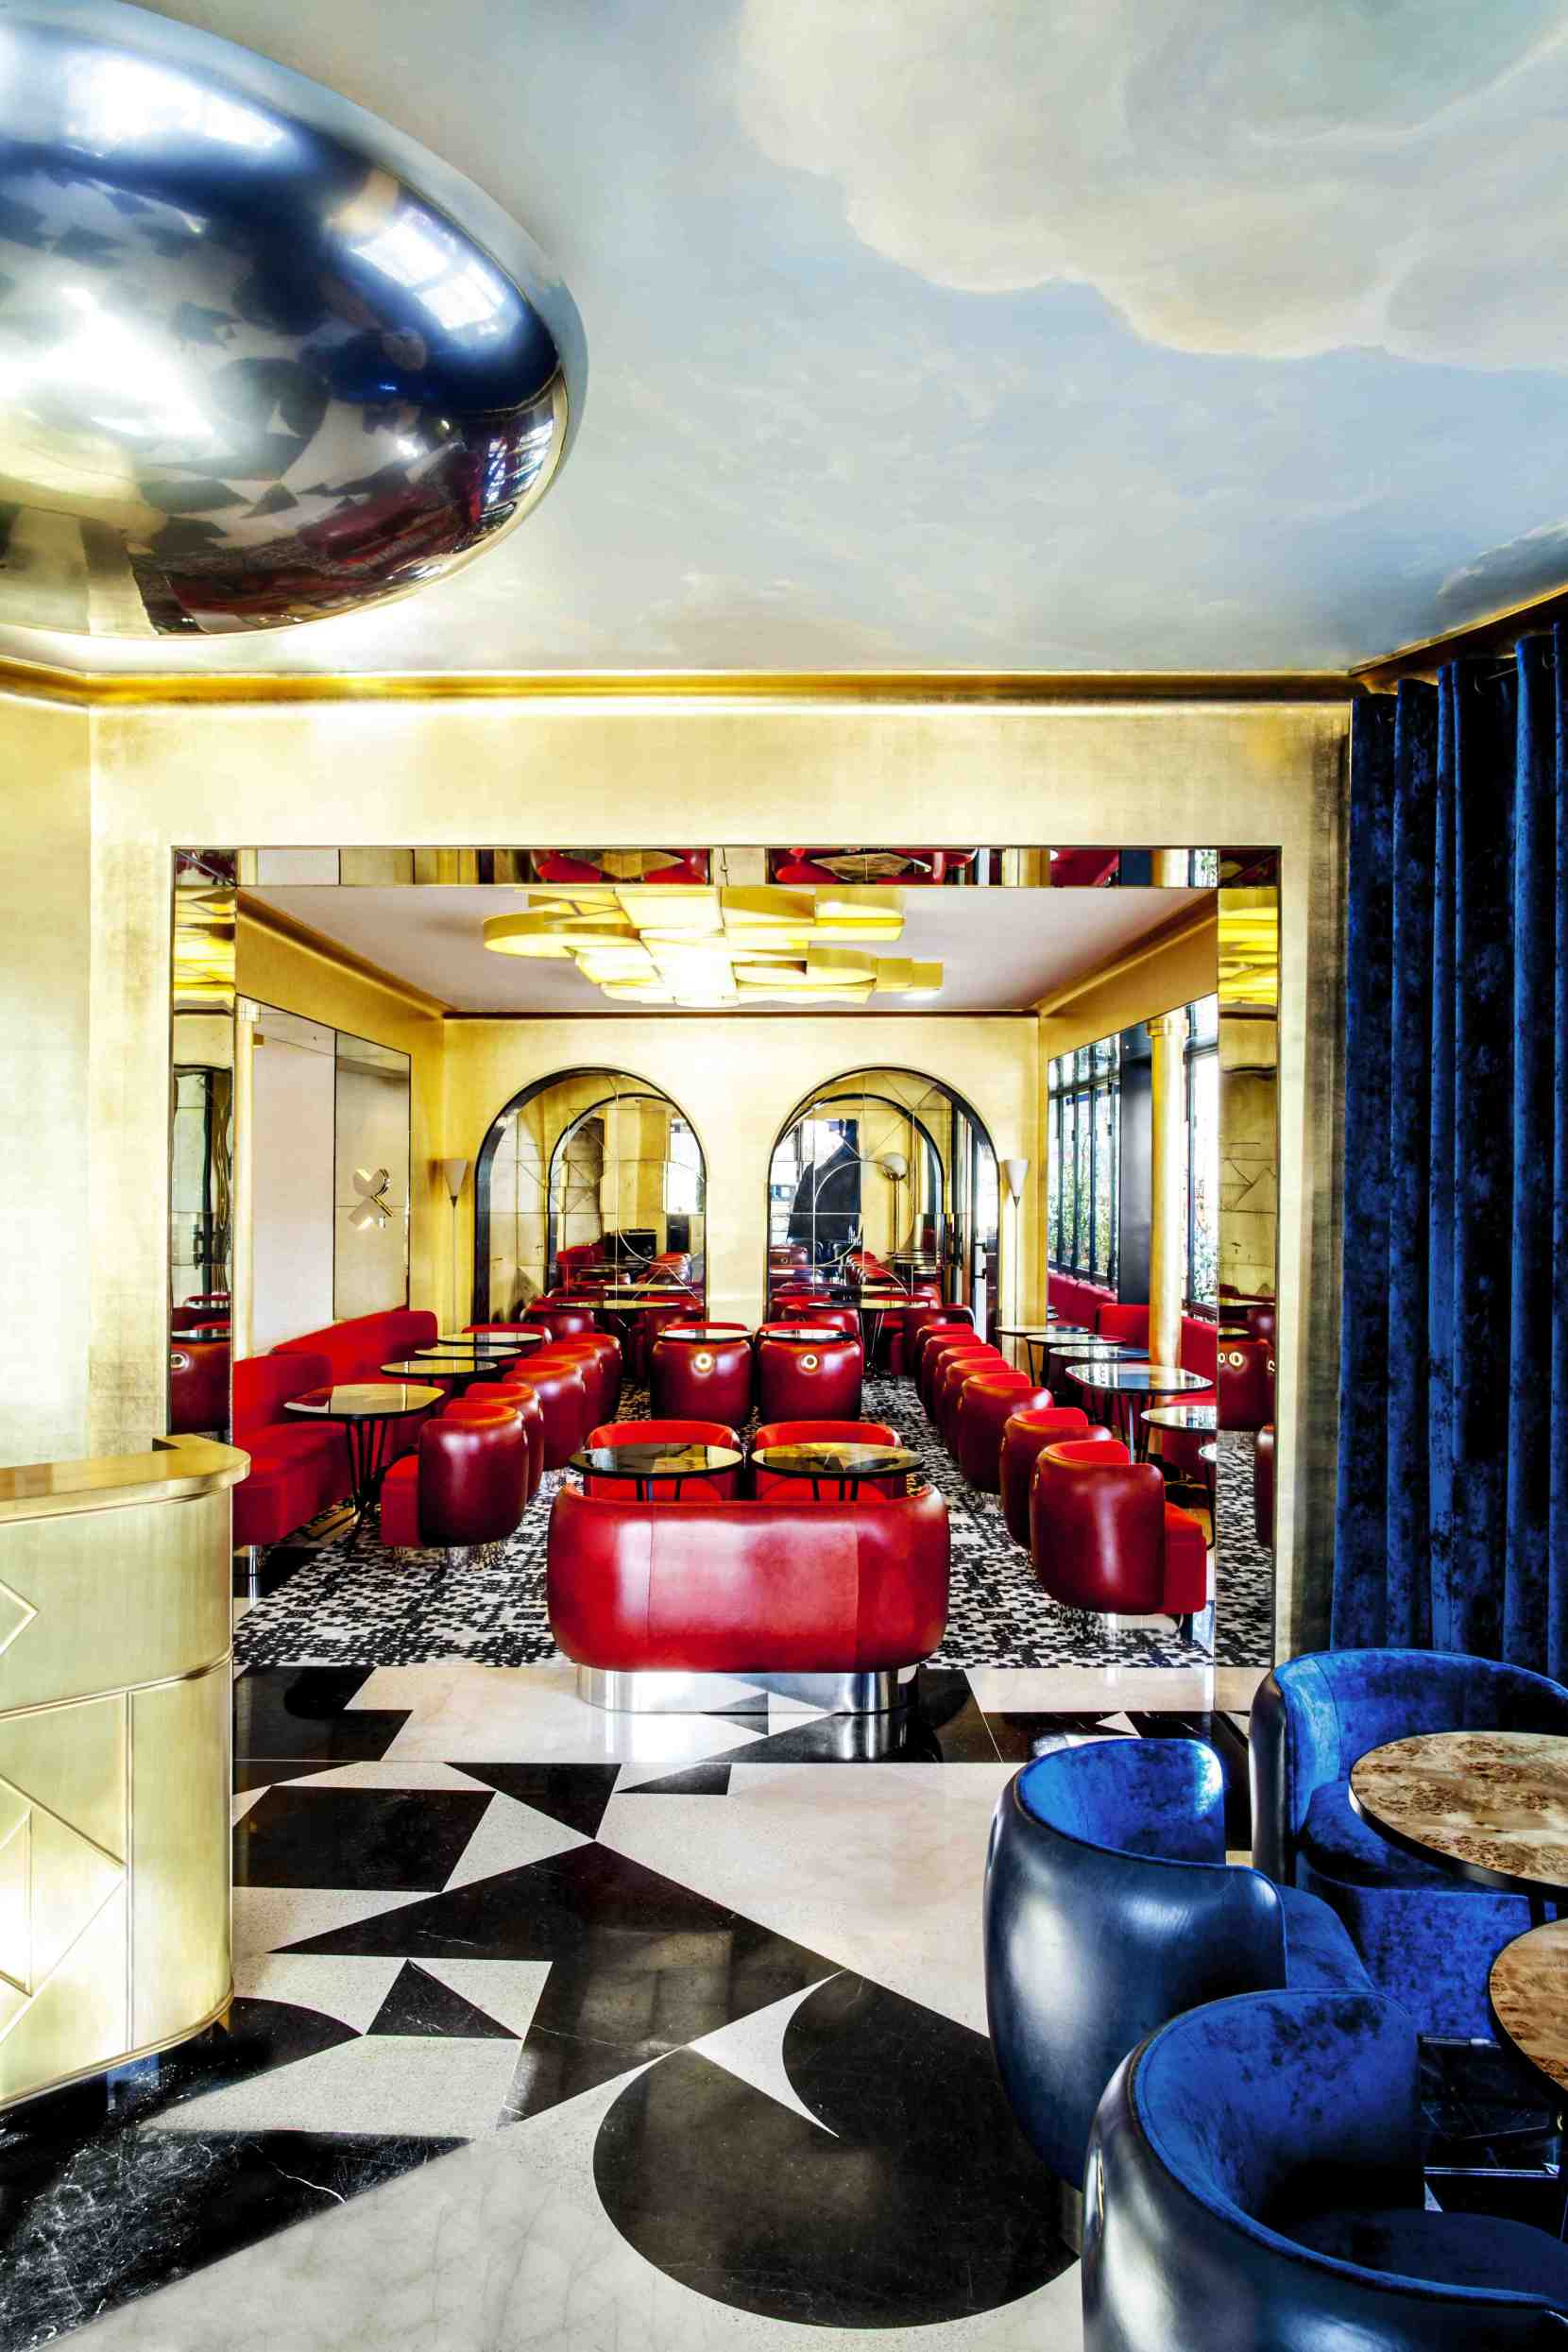 Spotlight IndiaMahdavi WTL Interior Designer To Watch India Mahdavi Paris Caf Franais Matthieu Salvaing 1660x2490